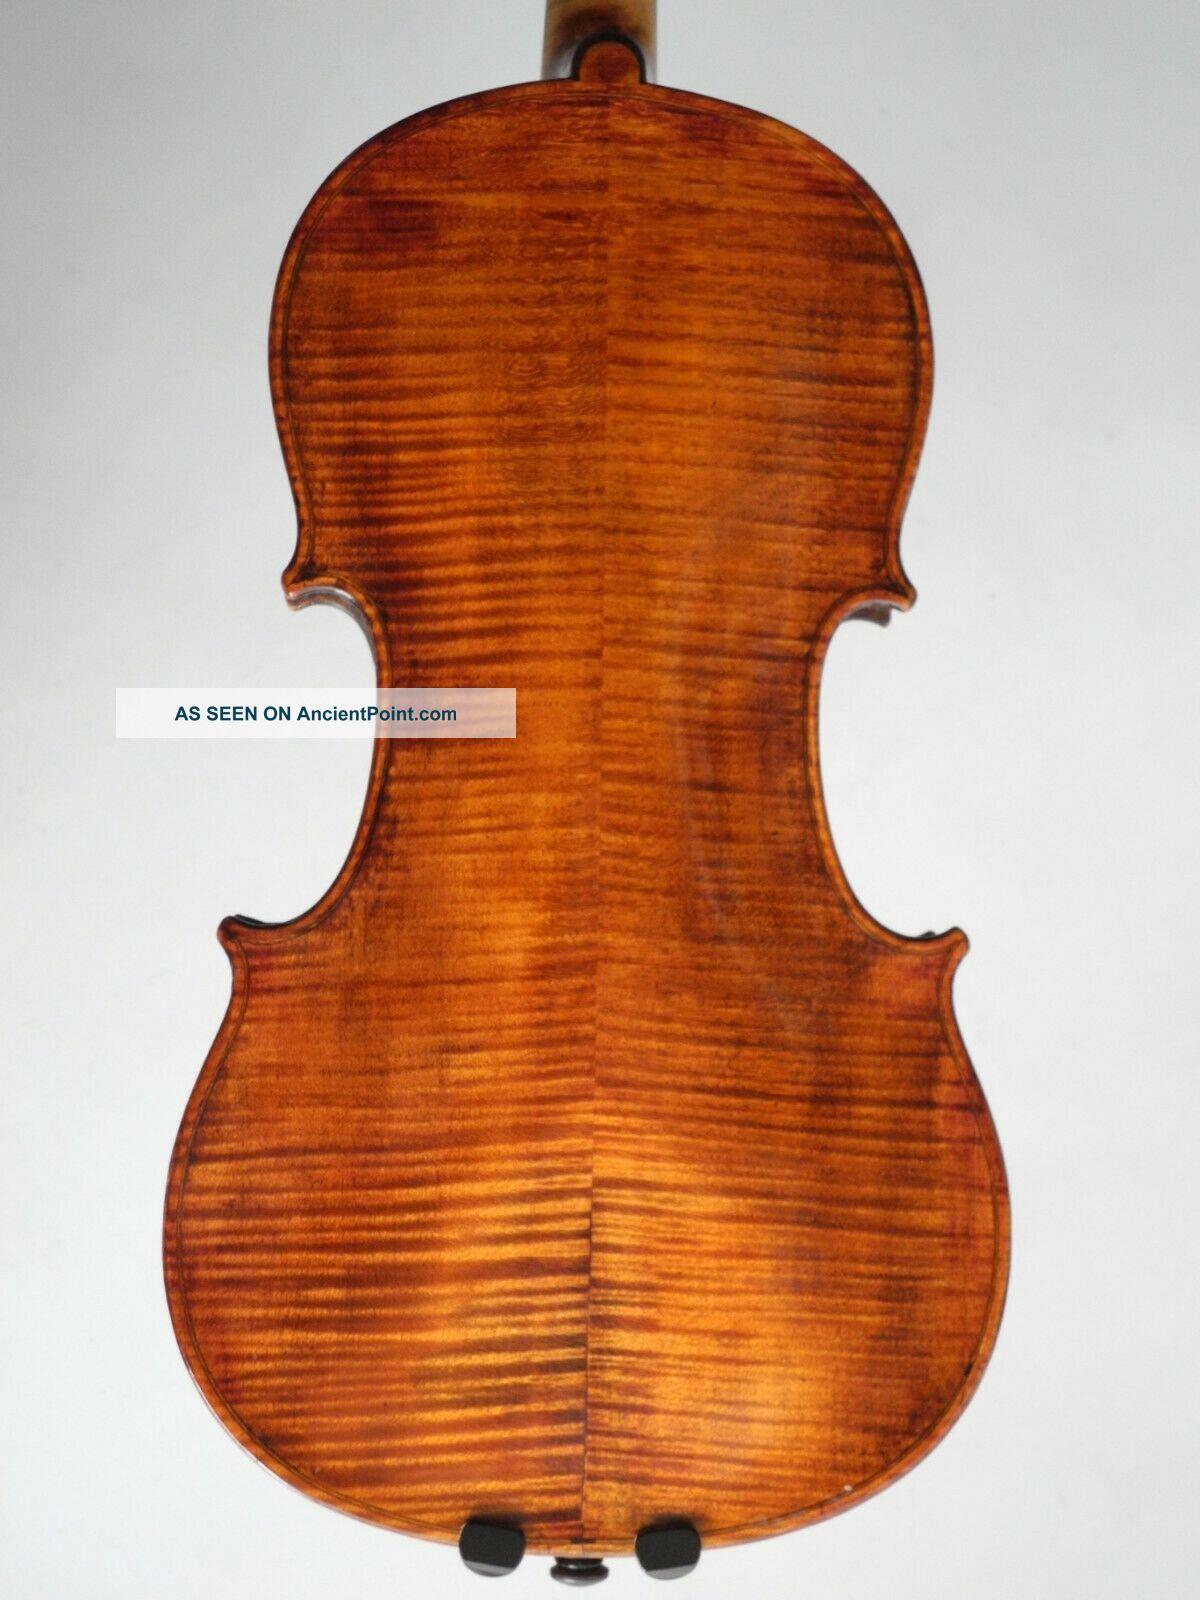 Old Violin 4/4 Labelled Antonius Comuni 1823 String photo